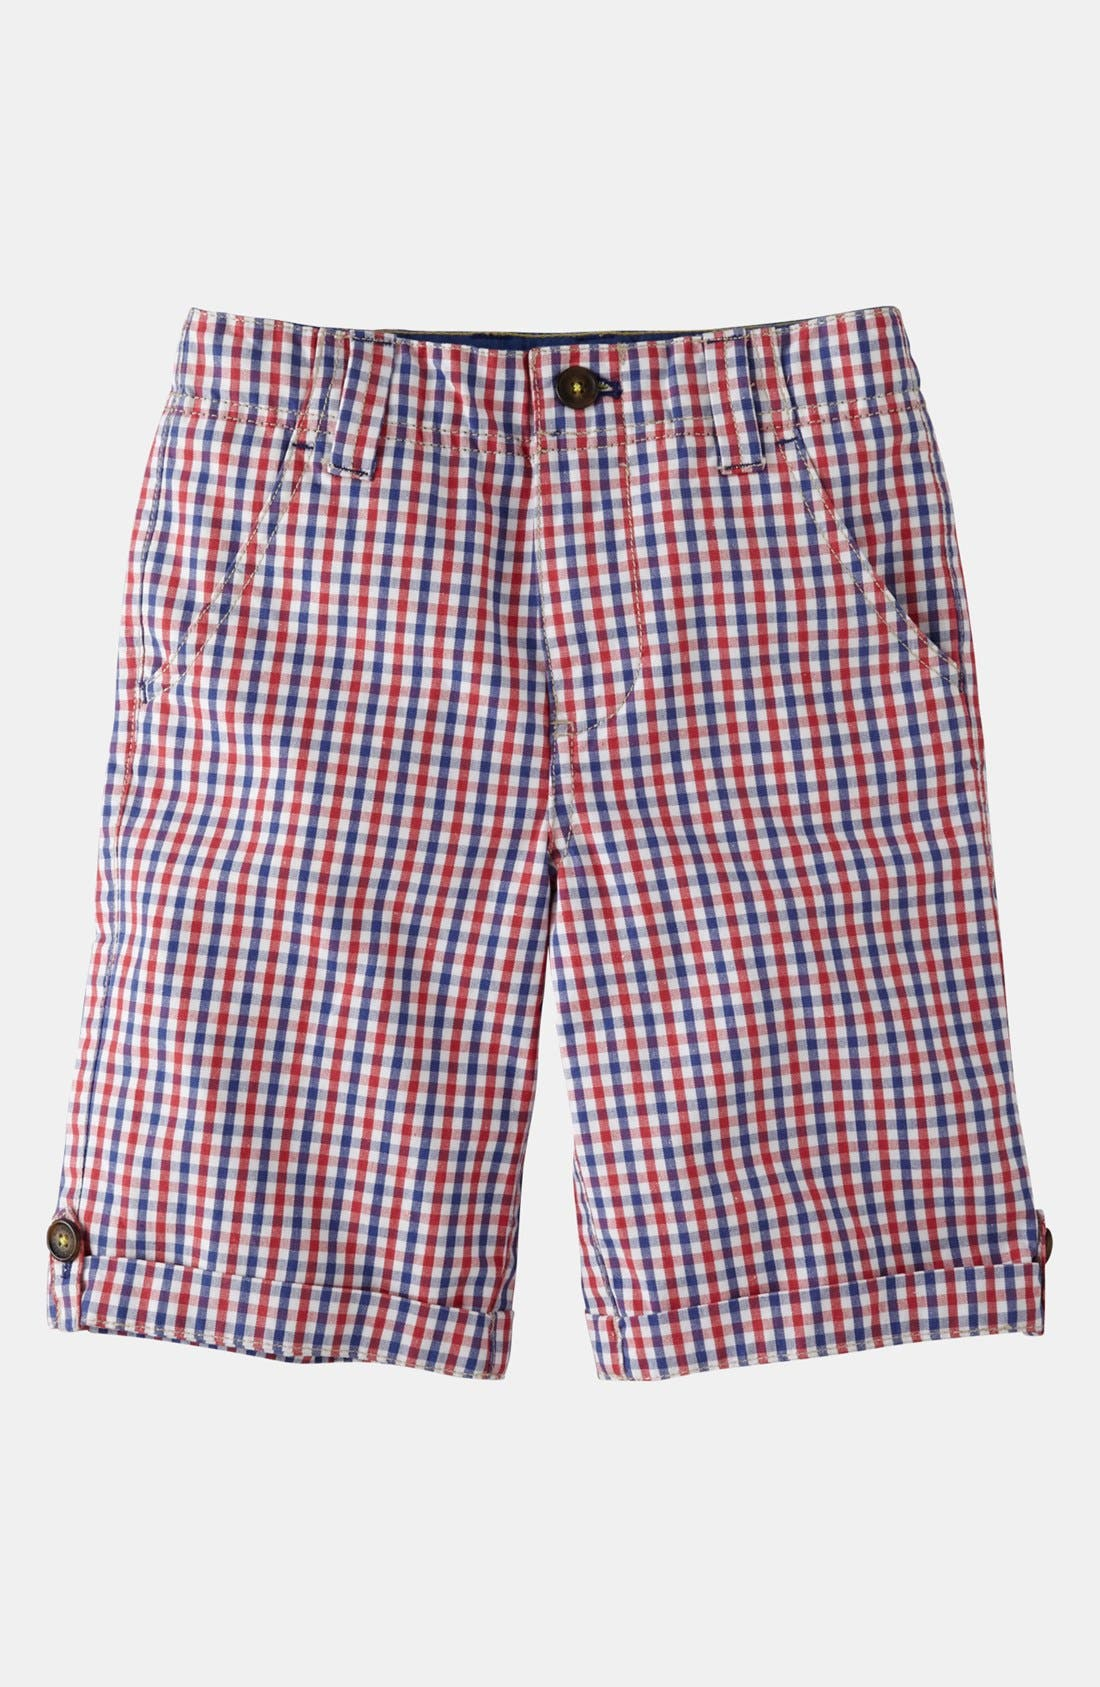 Alternate Image 1 Selected - Mini Boden Summer Shorts (Little Boys & Big Boys)